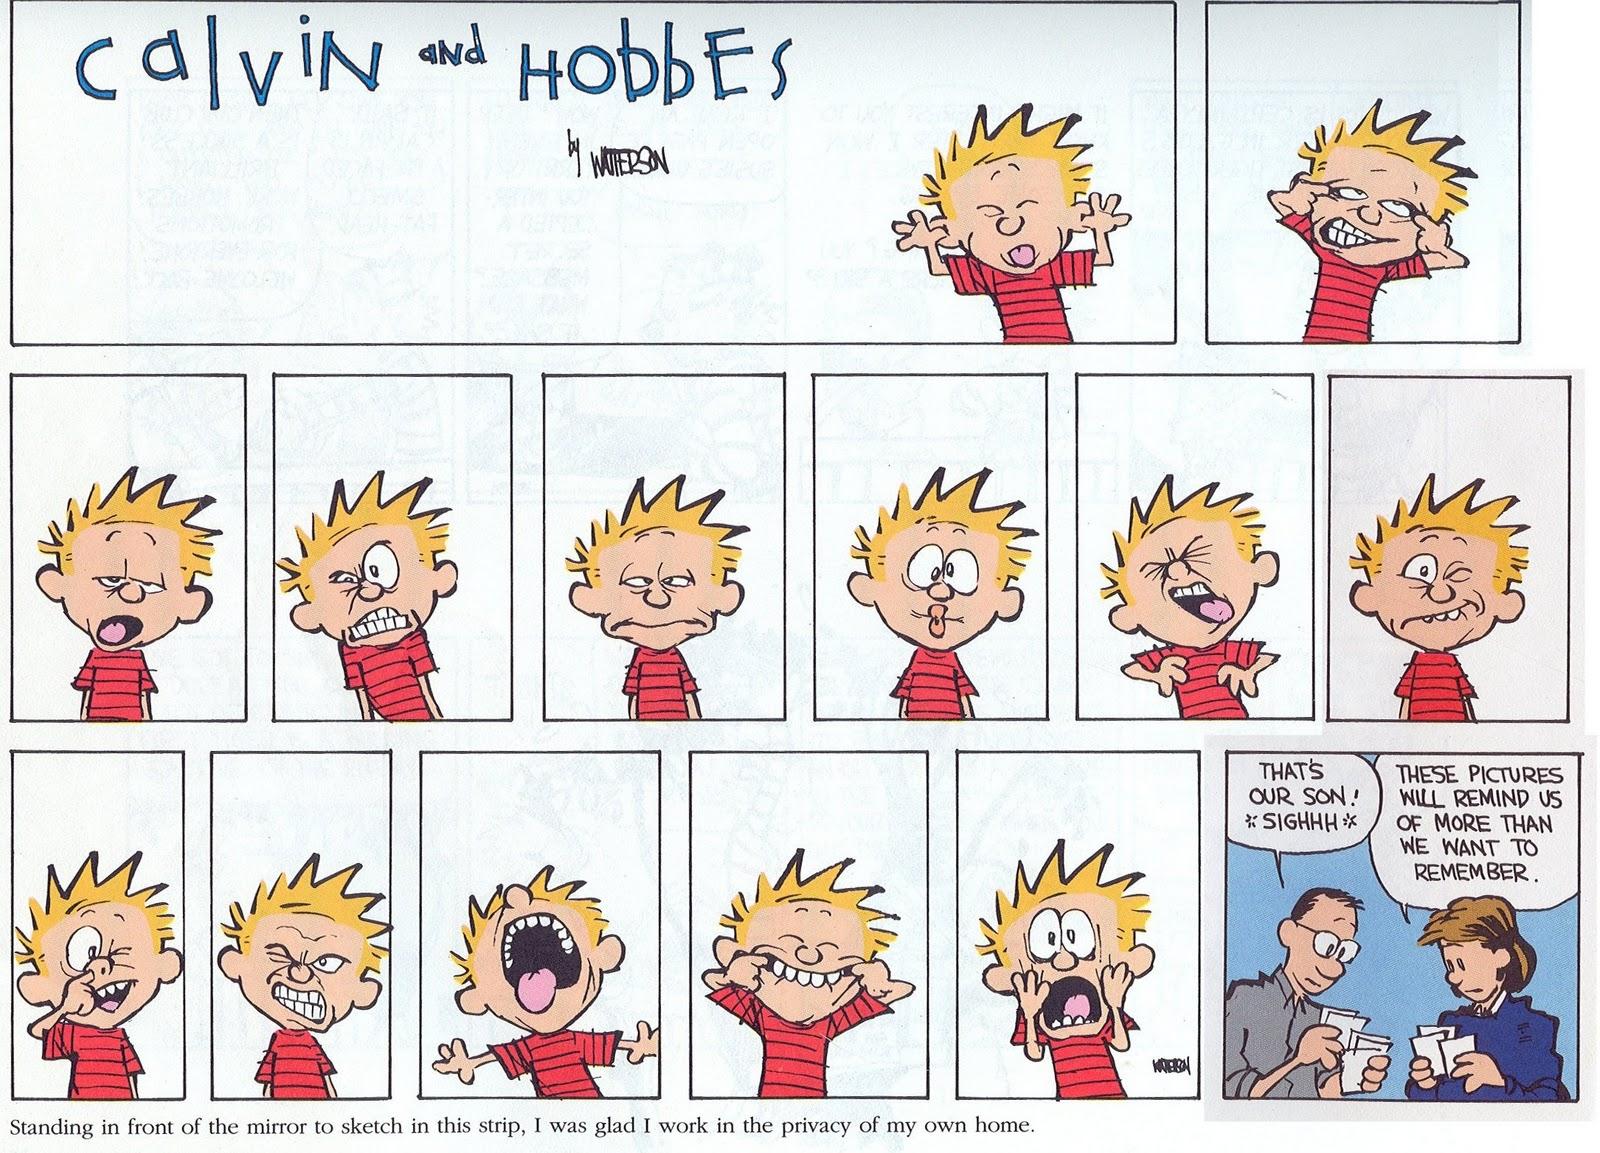 [Image: calvin+&+hobbes+faces.jpg]